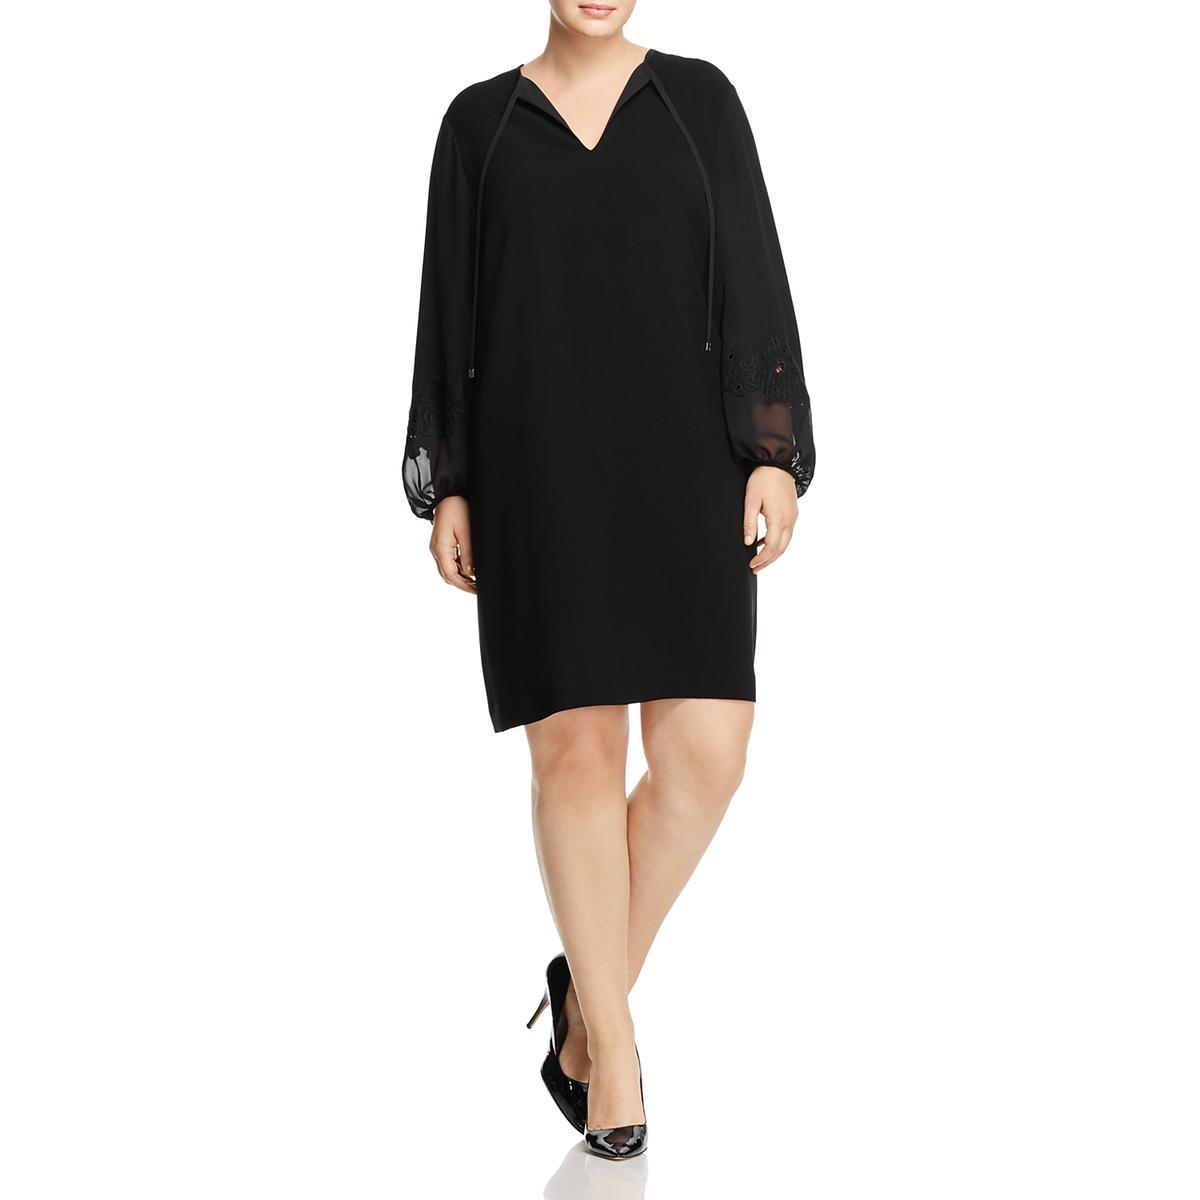 64f94fbcf22 Details about Lafayette 148 New York Womens Eli Black Party Dress Plus 1X  BHFO 4980